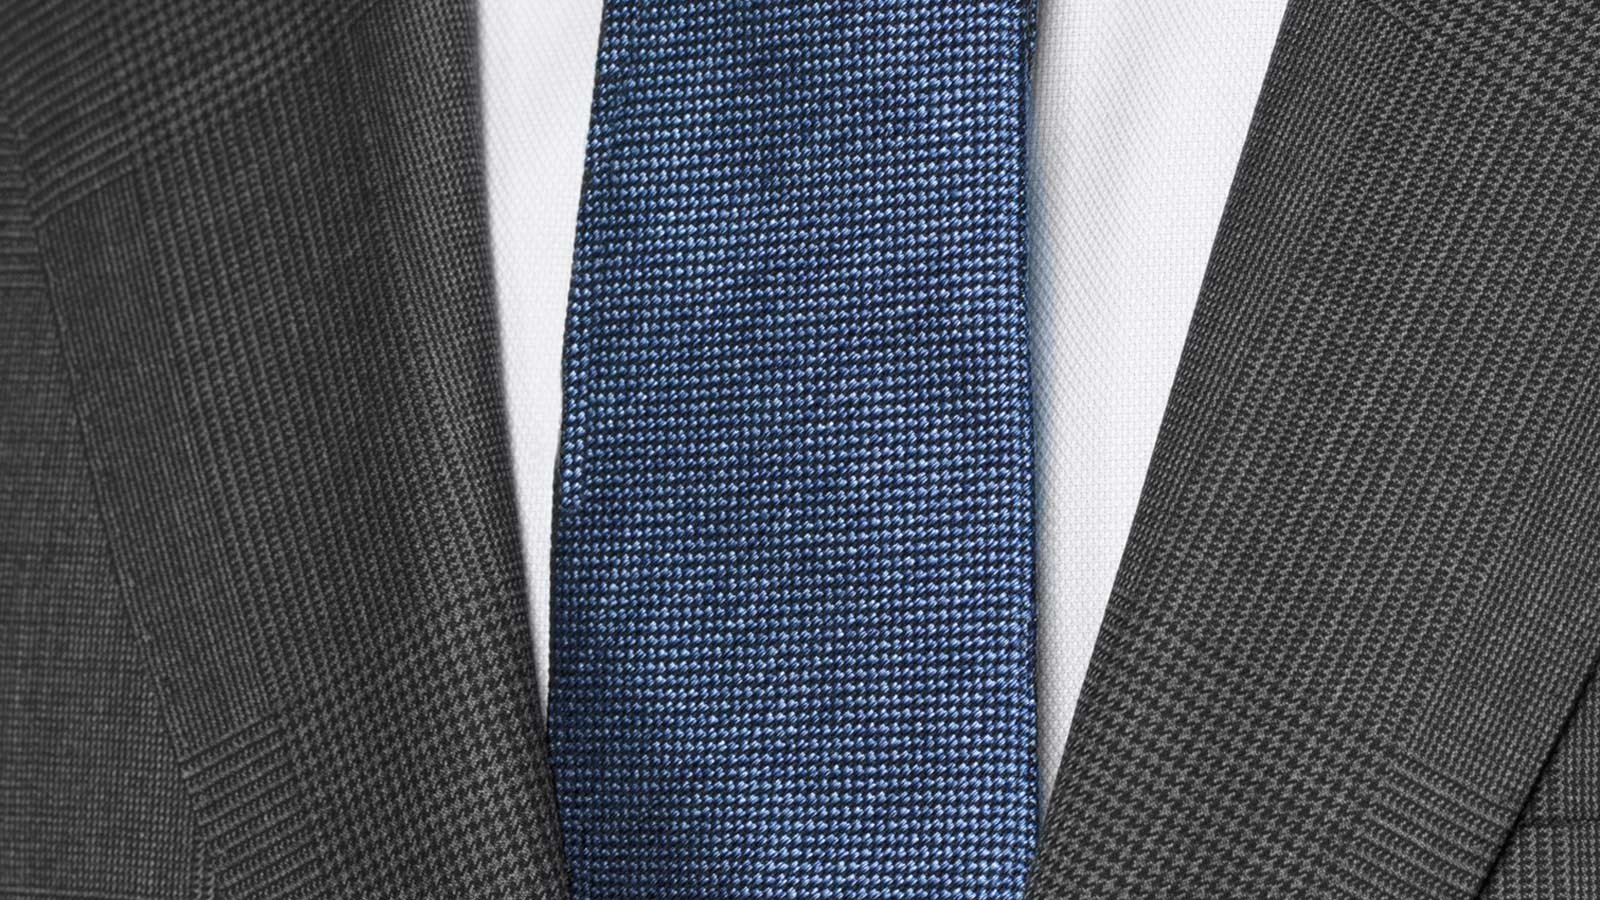 Vendetta Premium Charcoal Plaid Suit - slider image 1